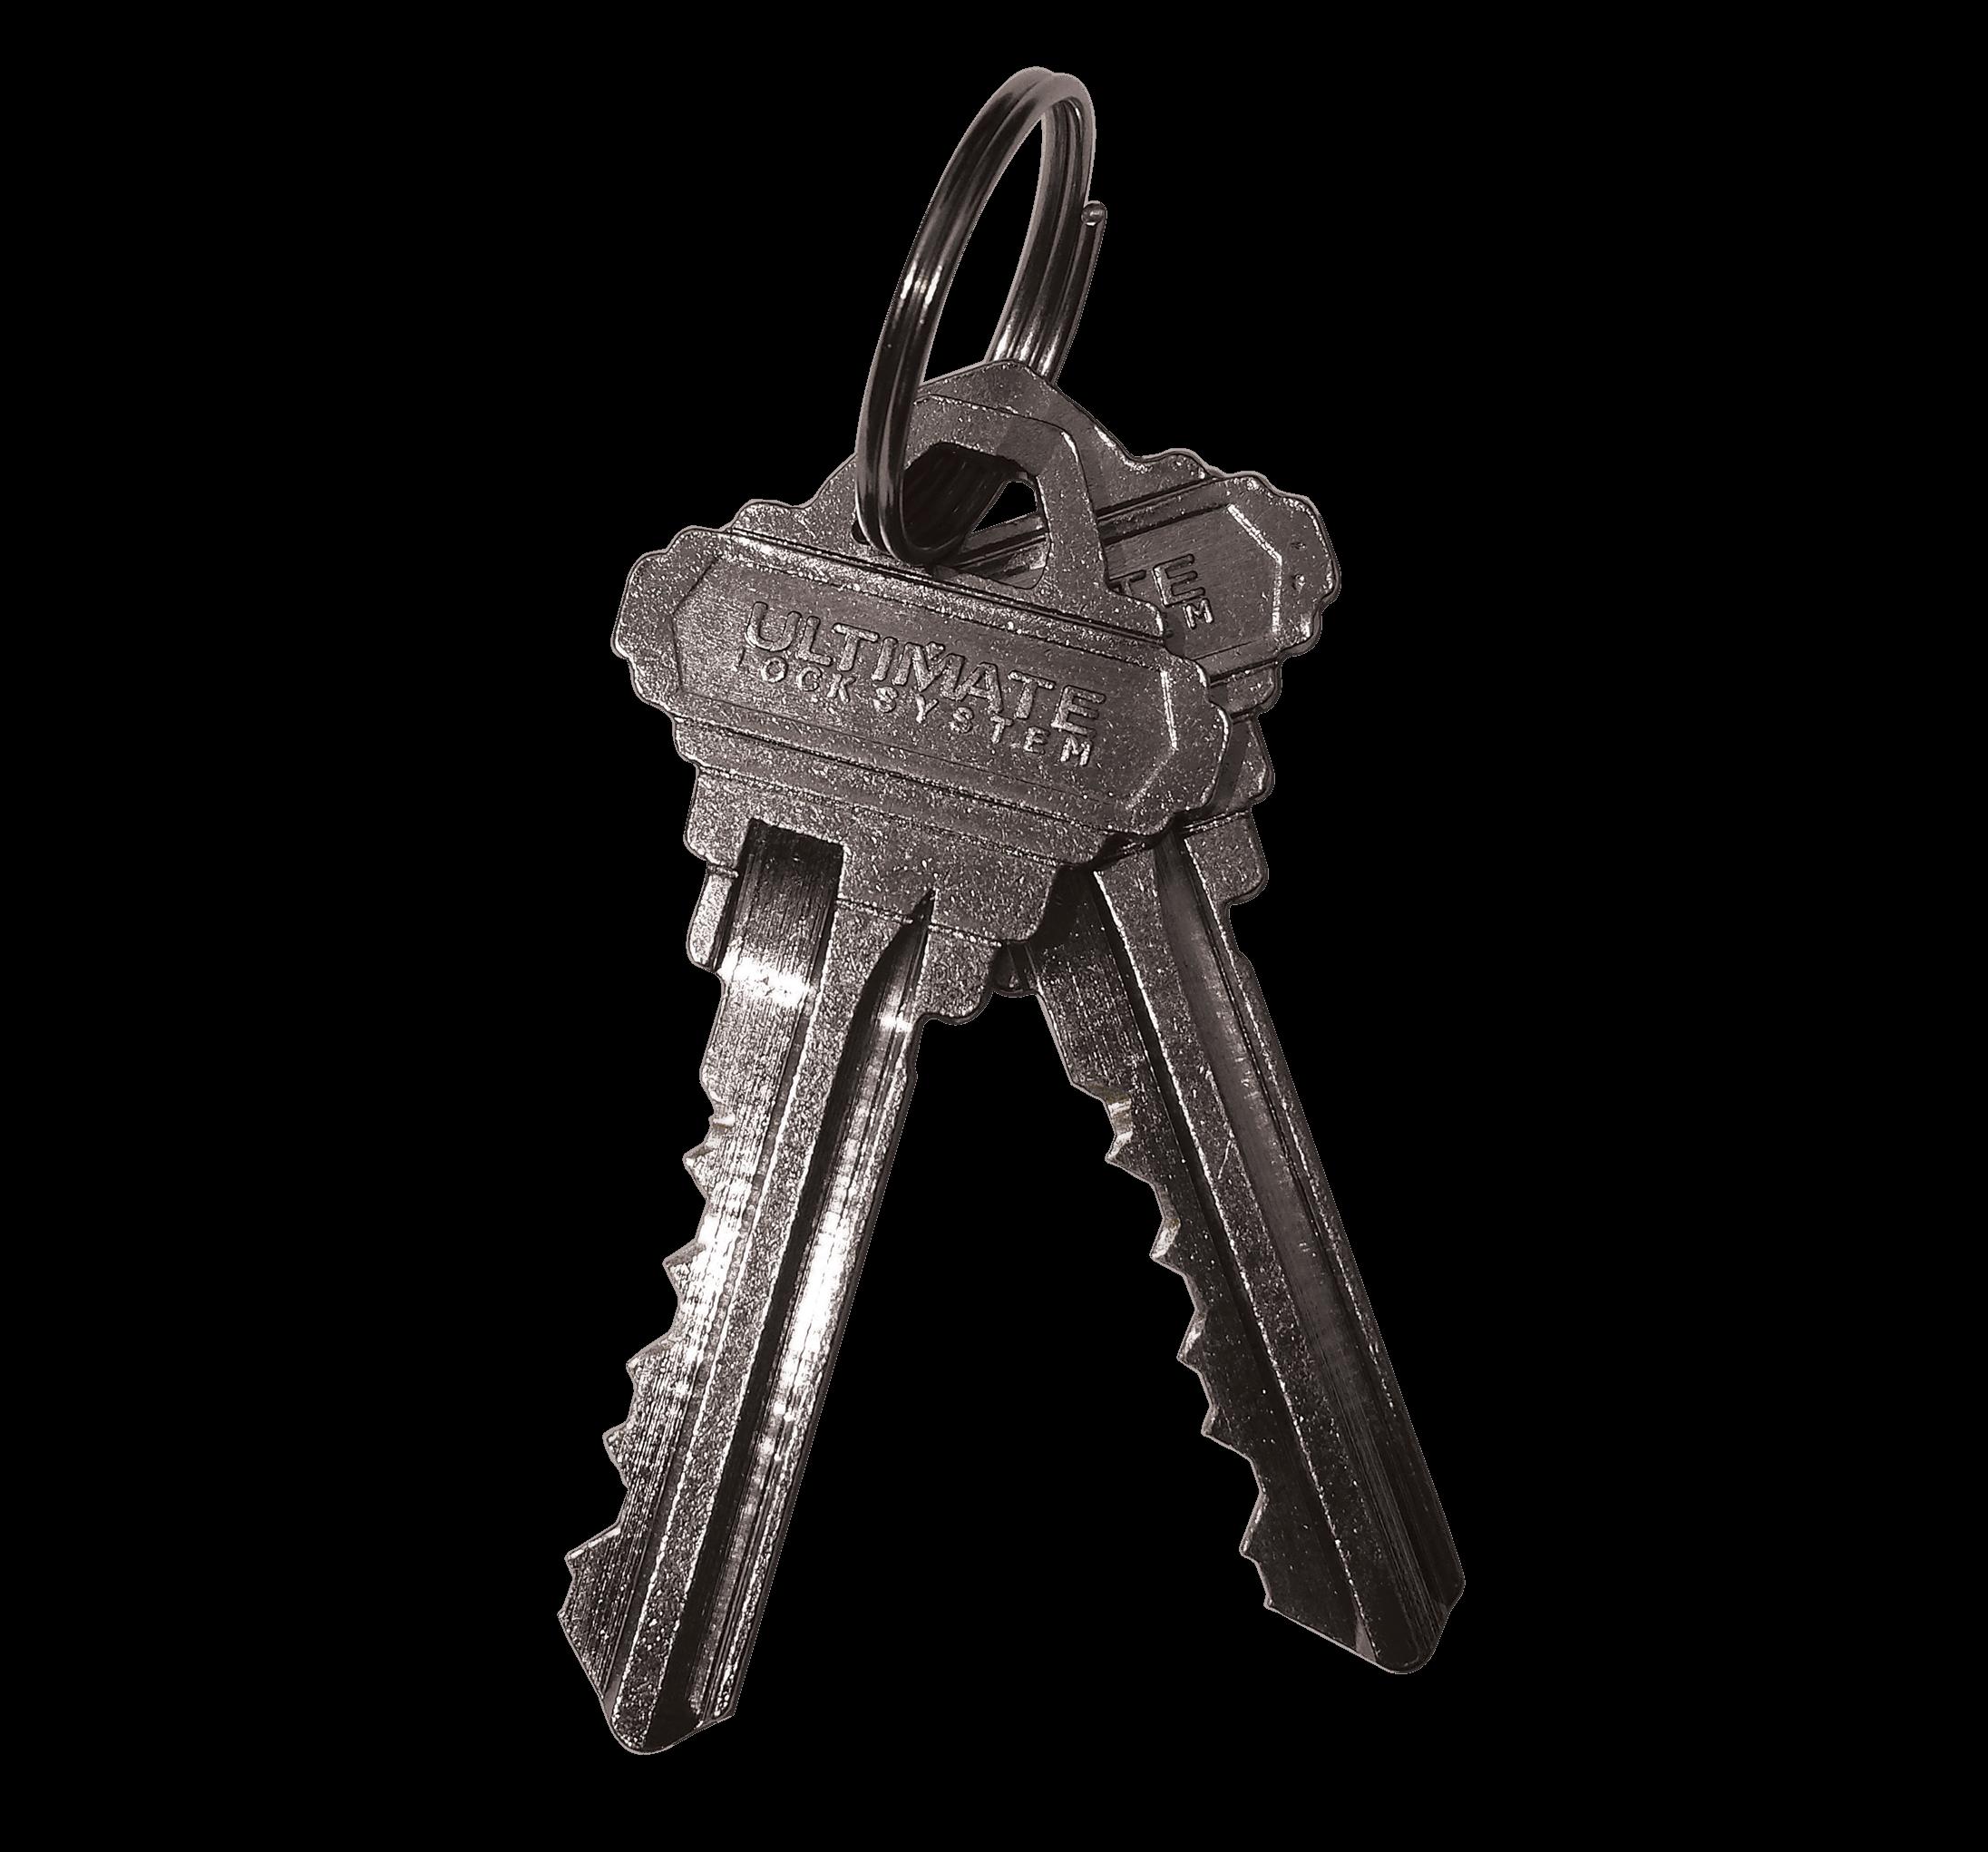 Additional keys | TheUltimateLock.com